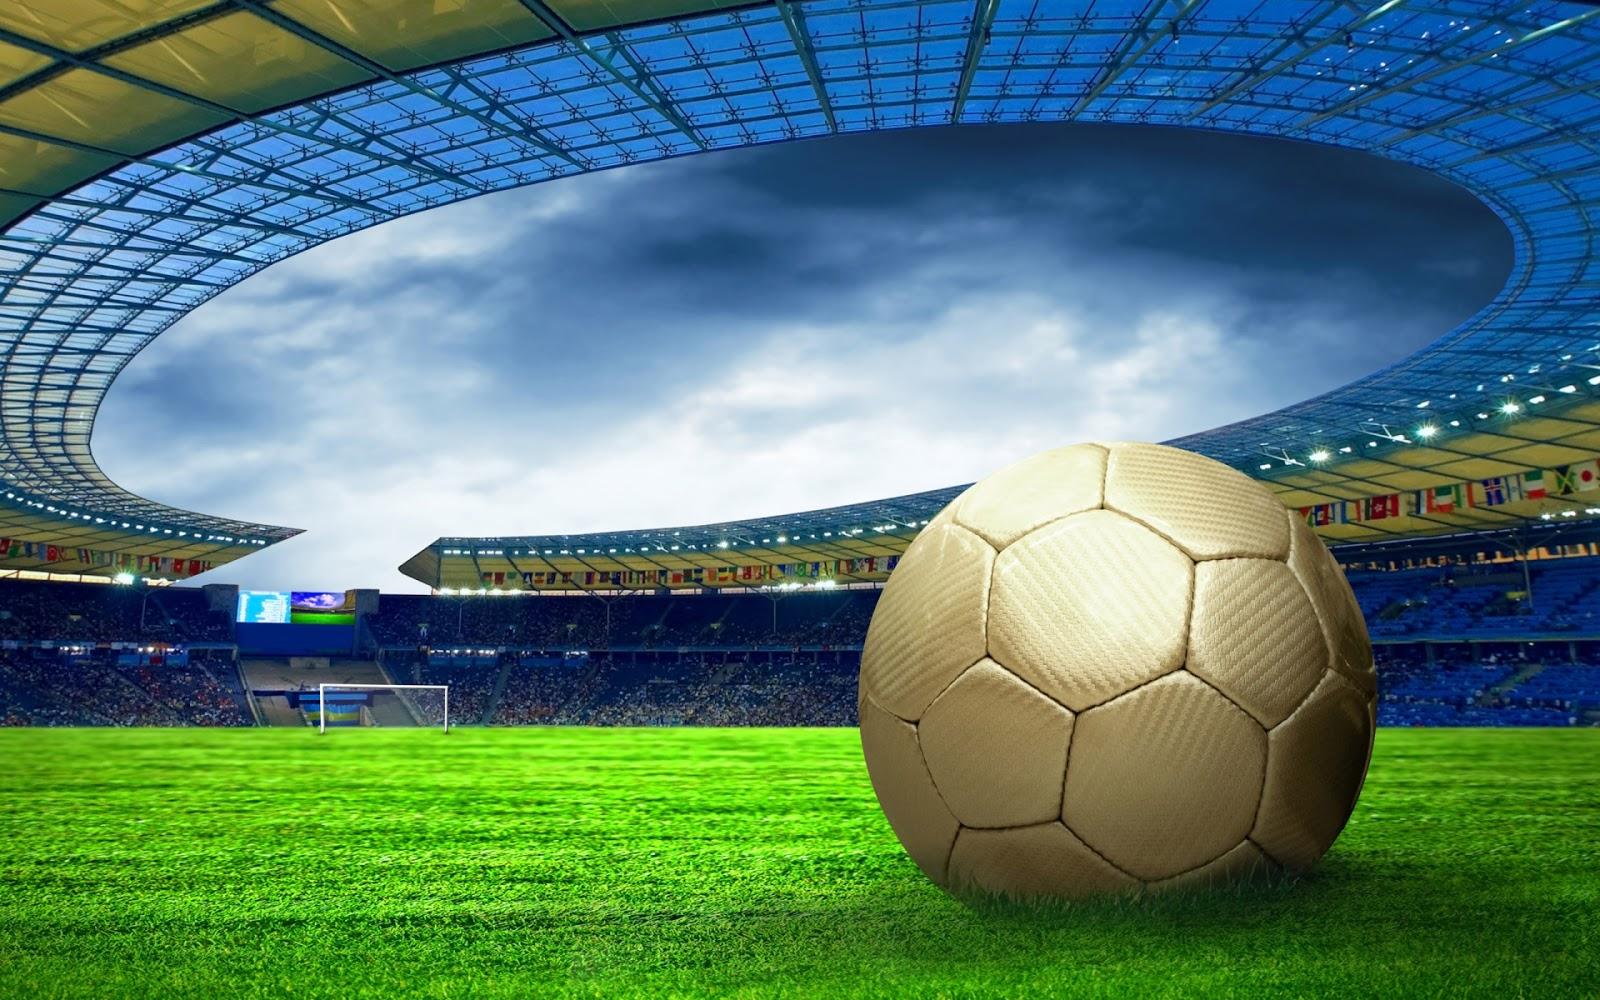 Etichete fotbal galerie foto galerie foto fotbal imagini fotbal